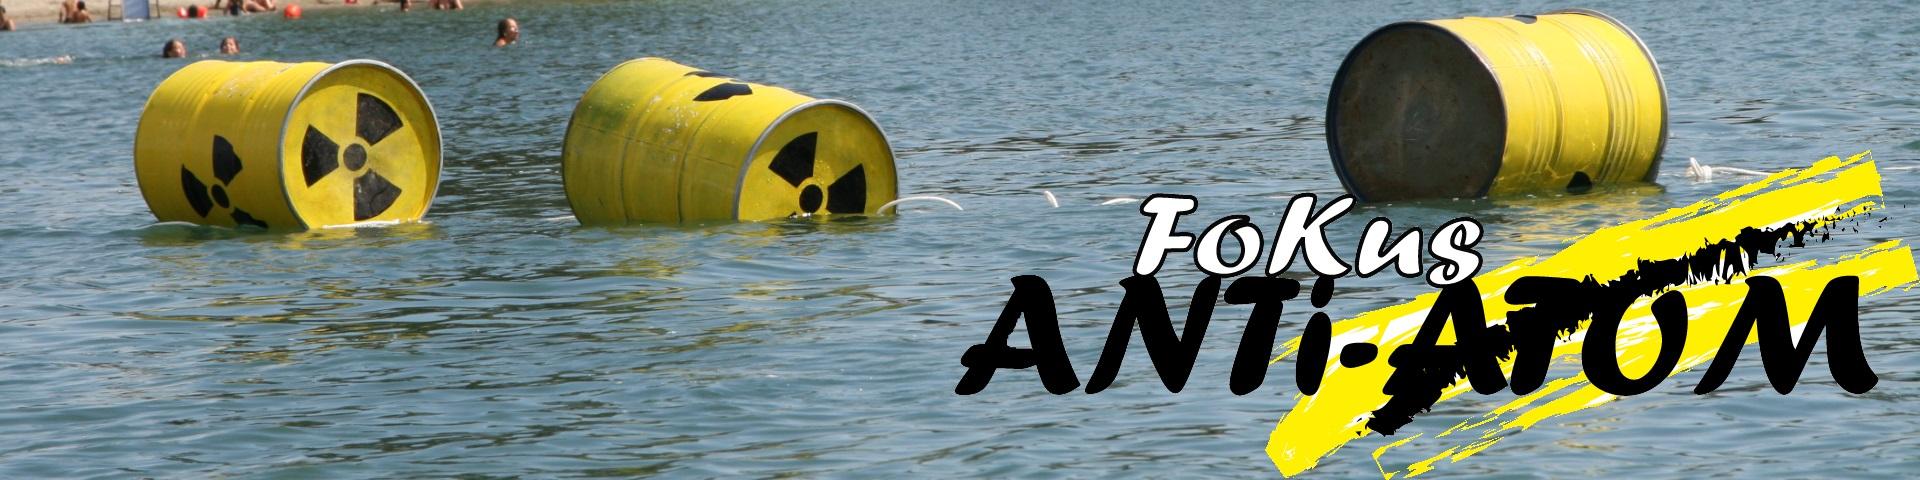 Fokus Anti-Atom